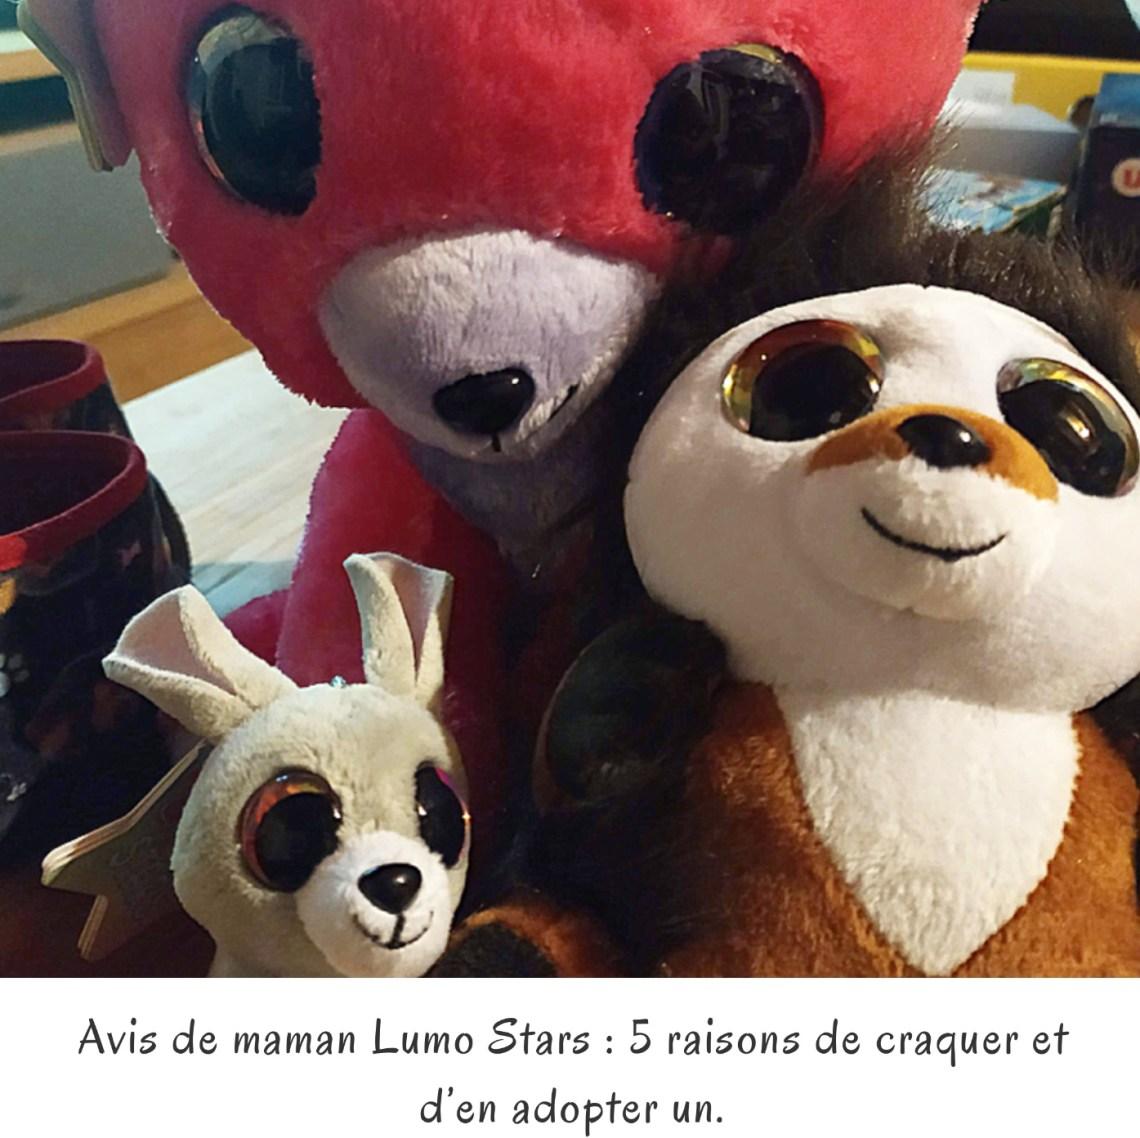 Avis de maman Lumo Stars : 5 raisons de craquer et d'en adopter un.